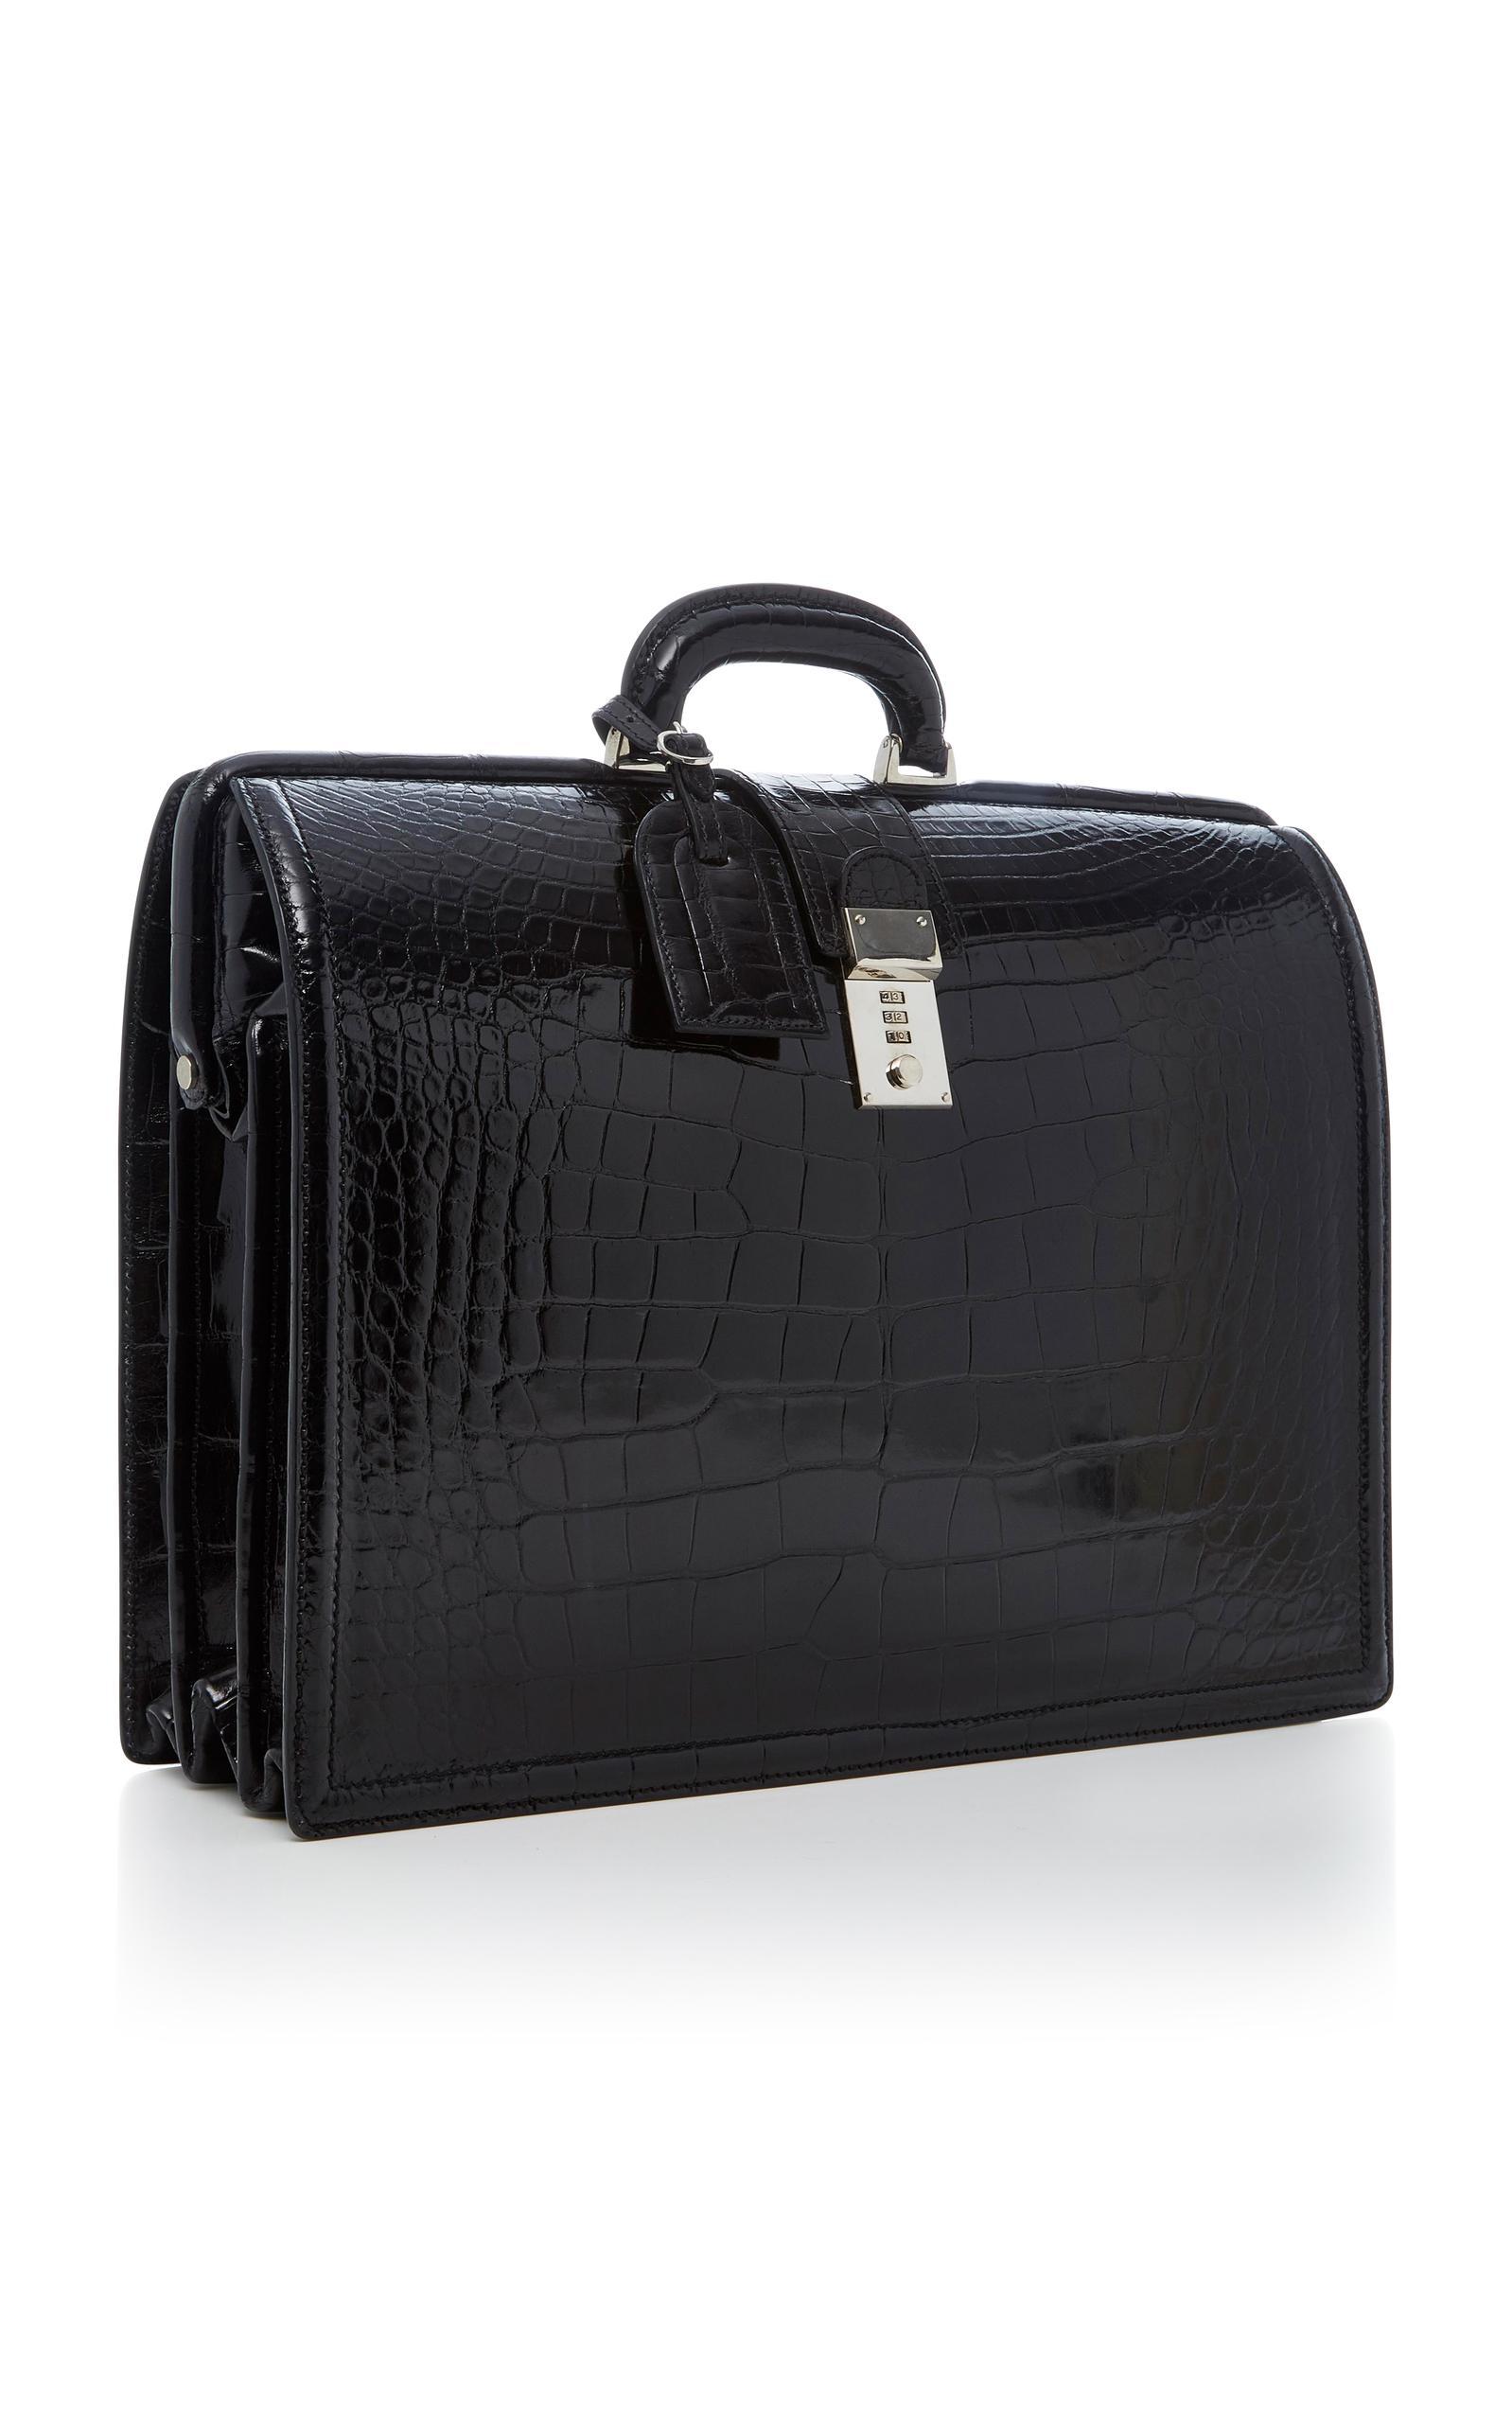 Alligator Brief Bag T. Anthony 18TaVpRzOL